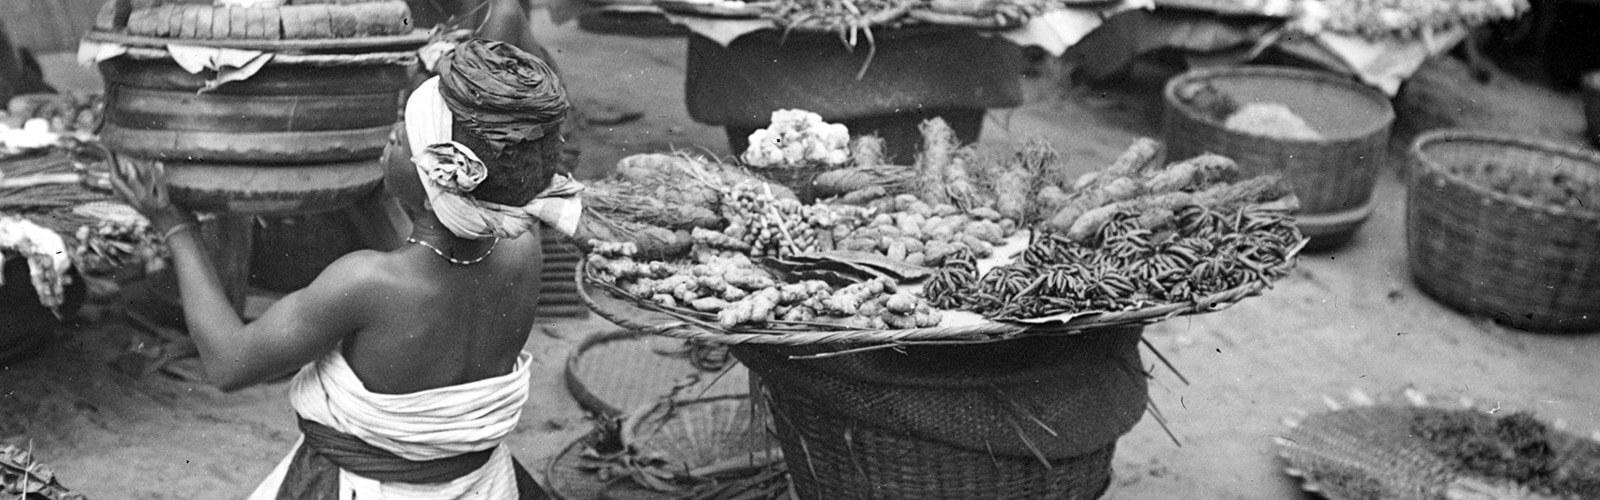 Porto Novo spice market, Benin Y. Henry © CIRAD